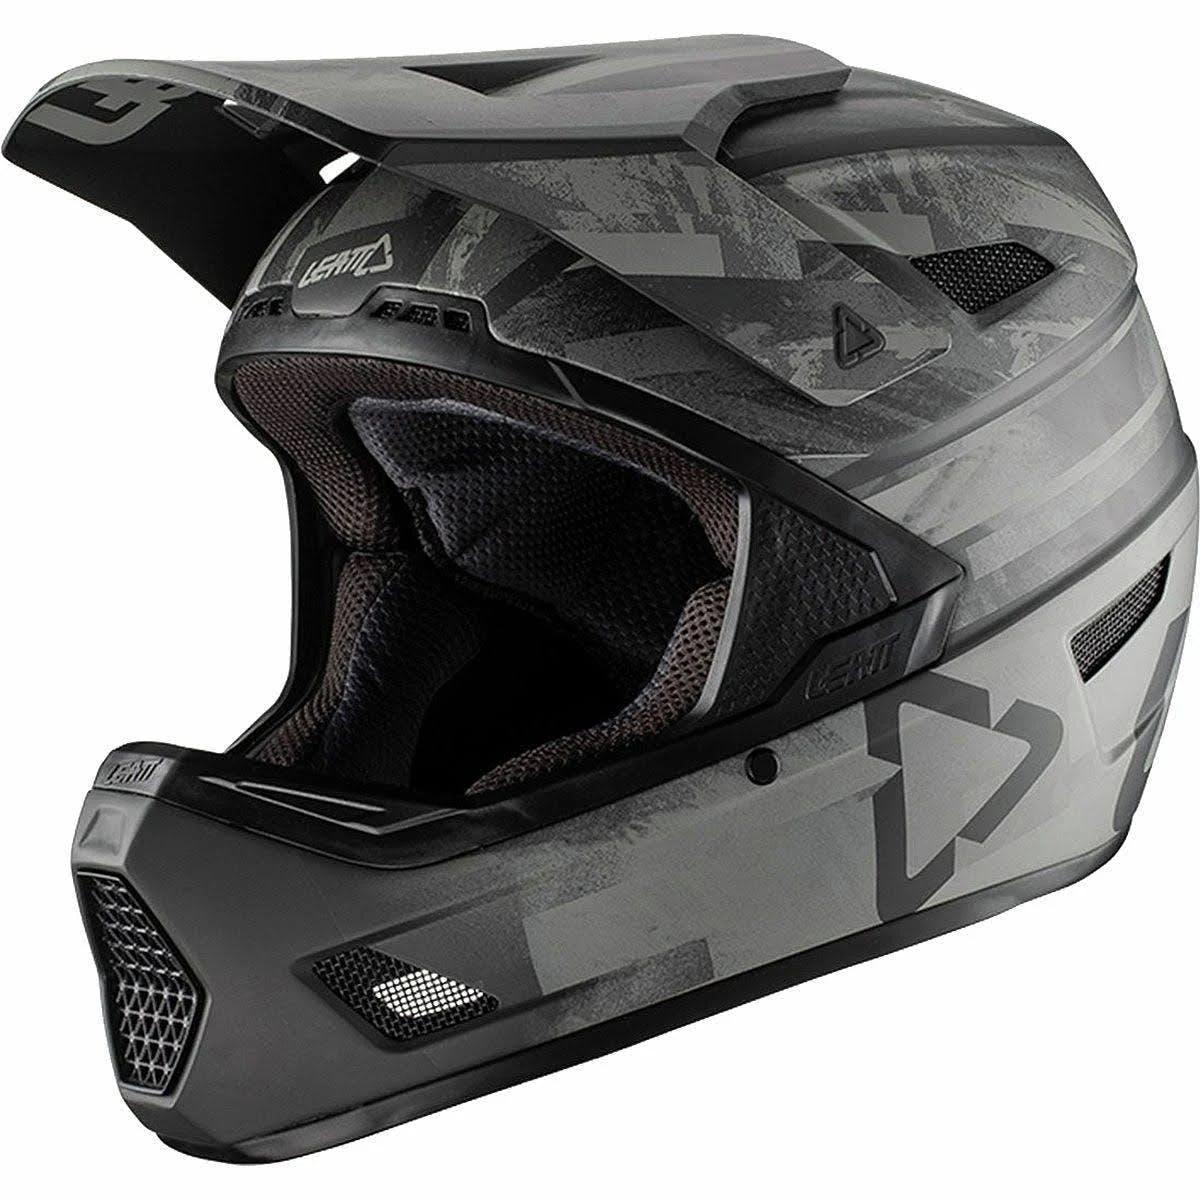 Leatt DBX 3.0 DH V20.1 Helmet - XL - Black